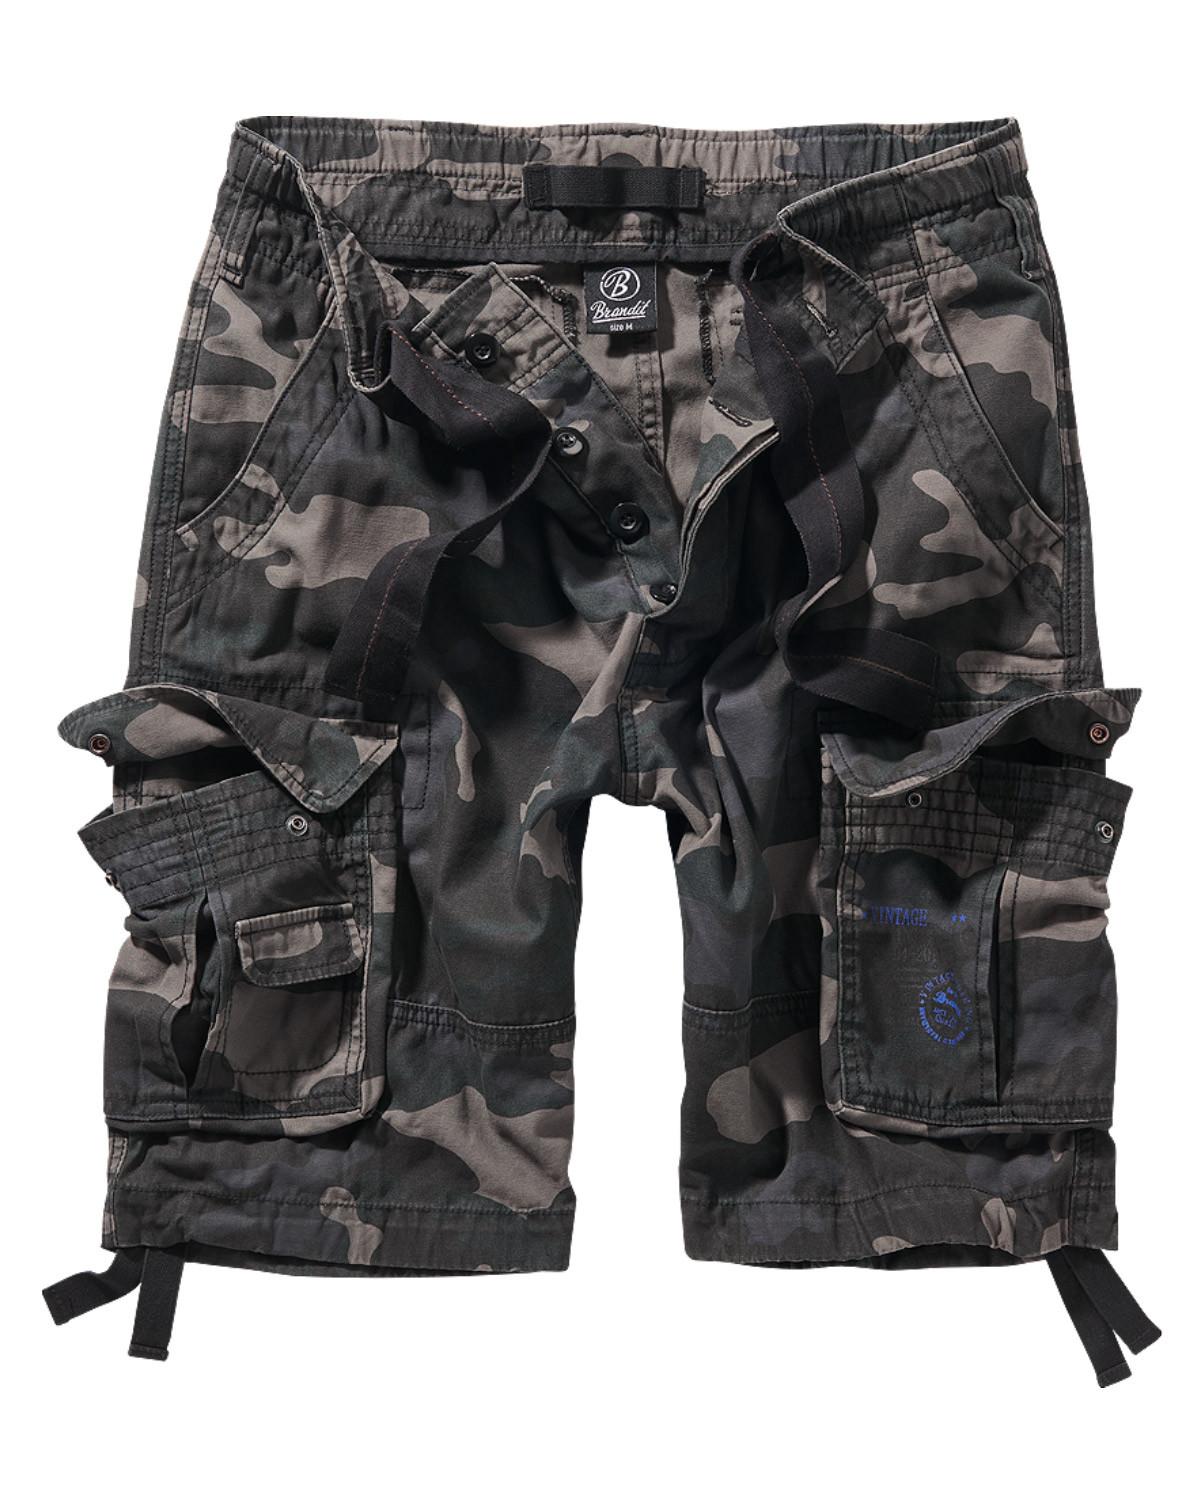 Image of   Brandit Pure Vintage Shorts (Black Camo, 2XL)